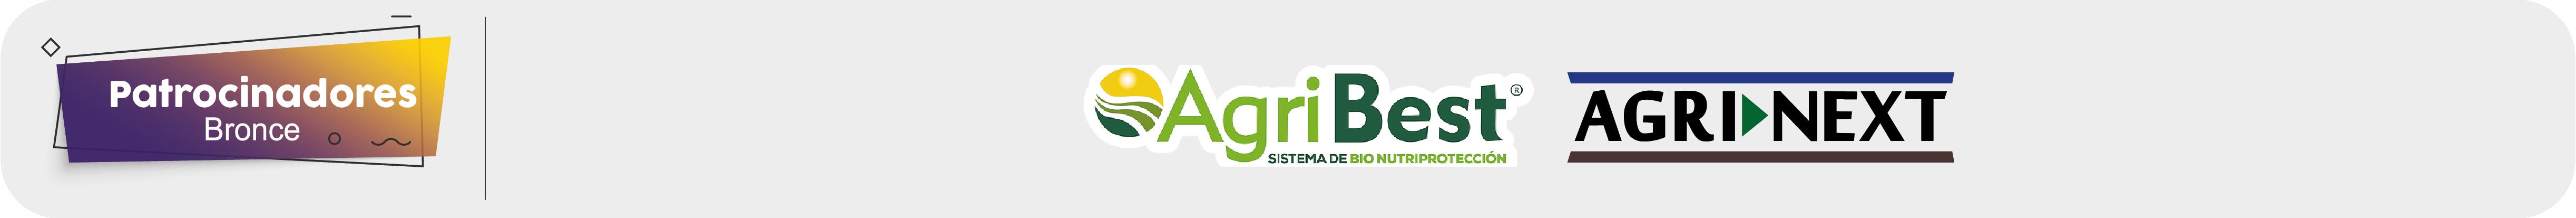 https://fitosanidad.com/wp-content/uploads/2019/07/Slide-Patrocinadores_7-1.png